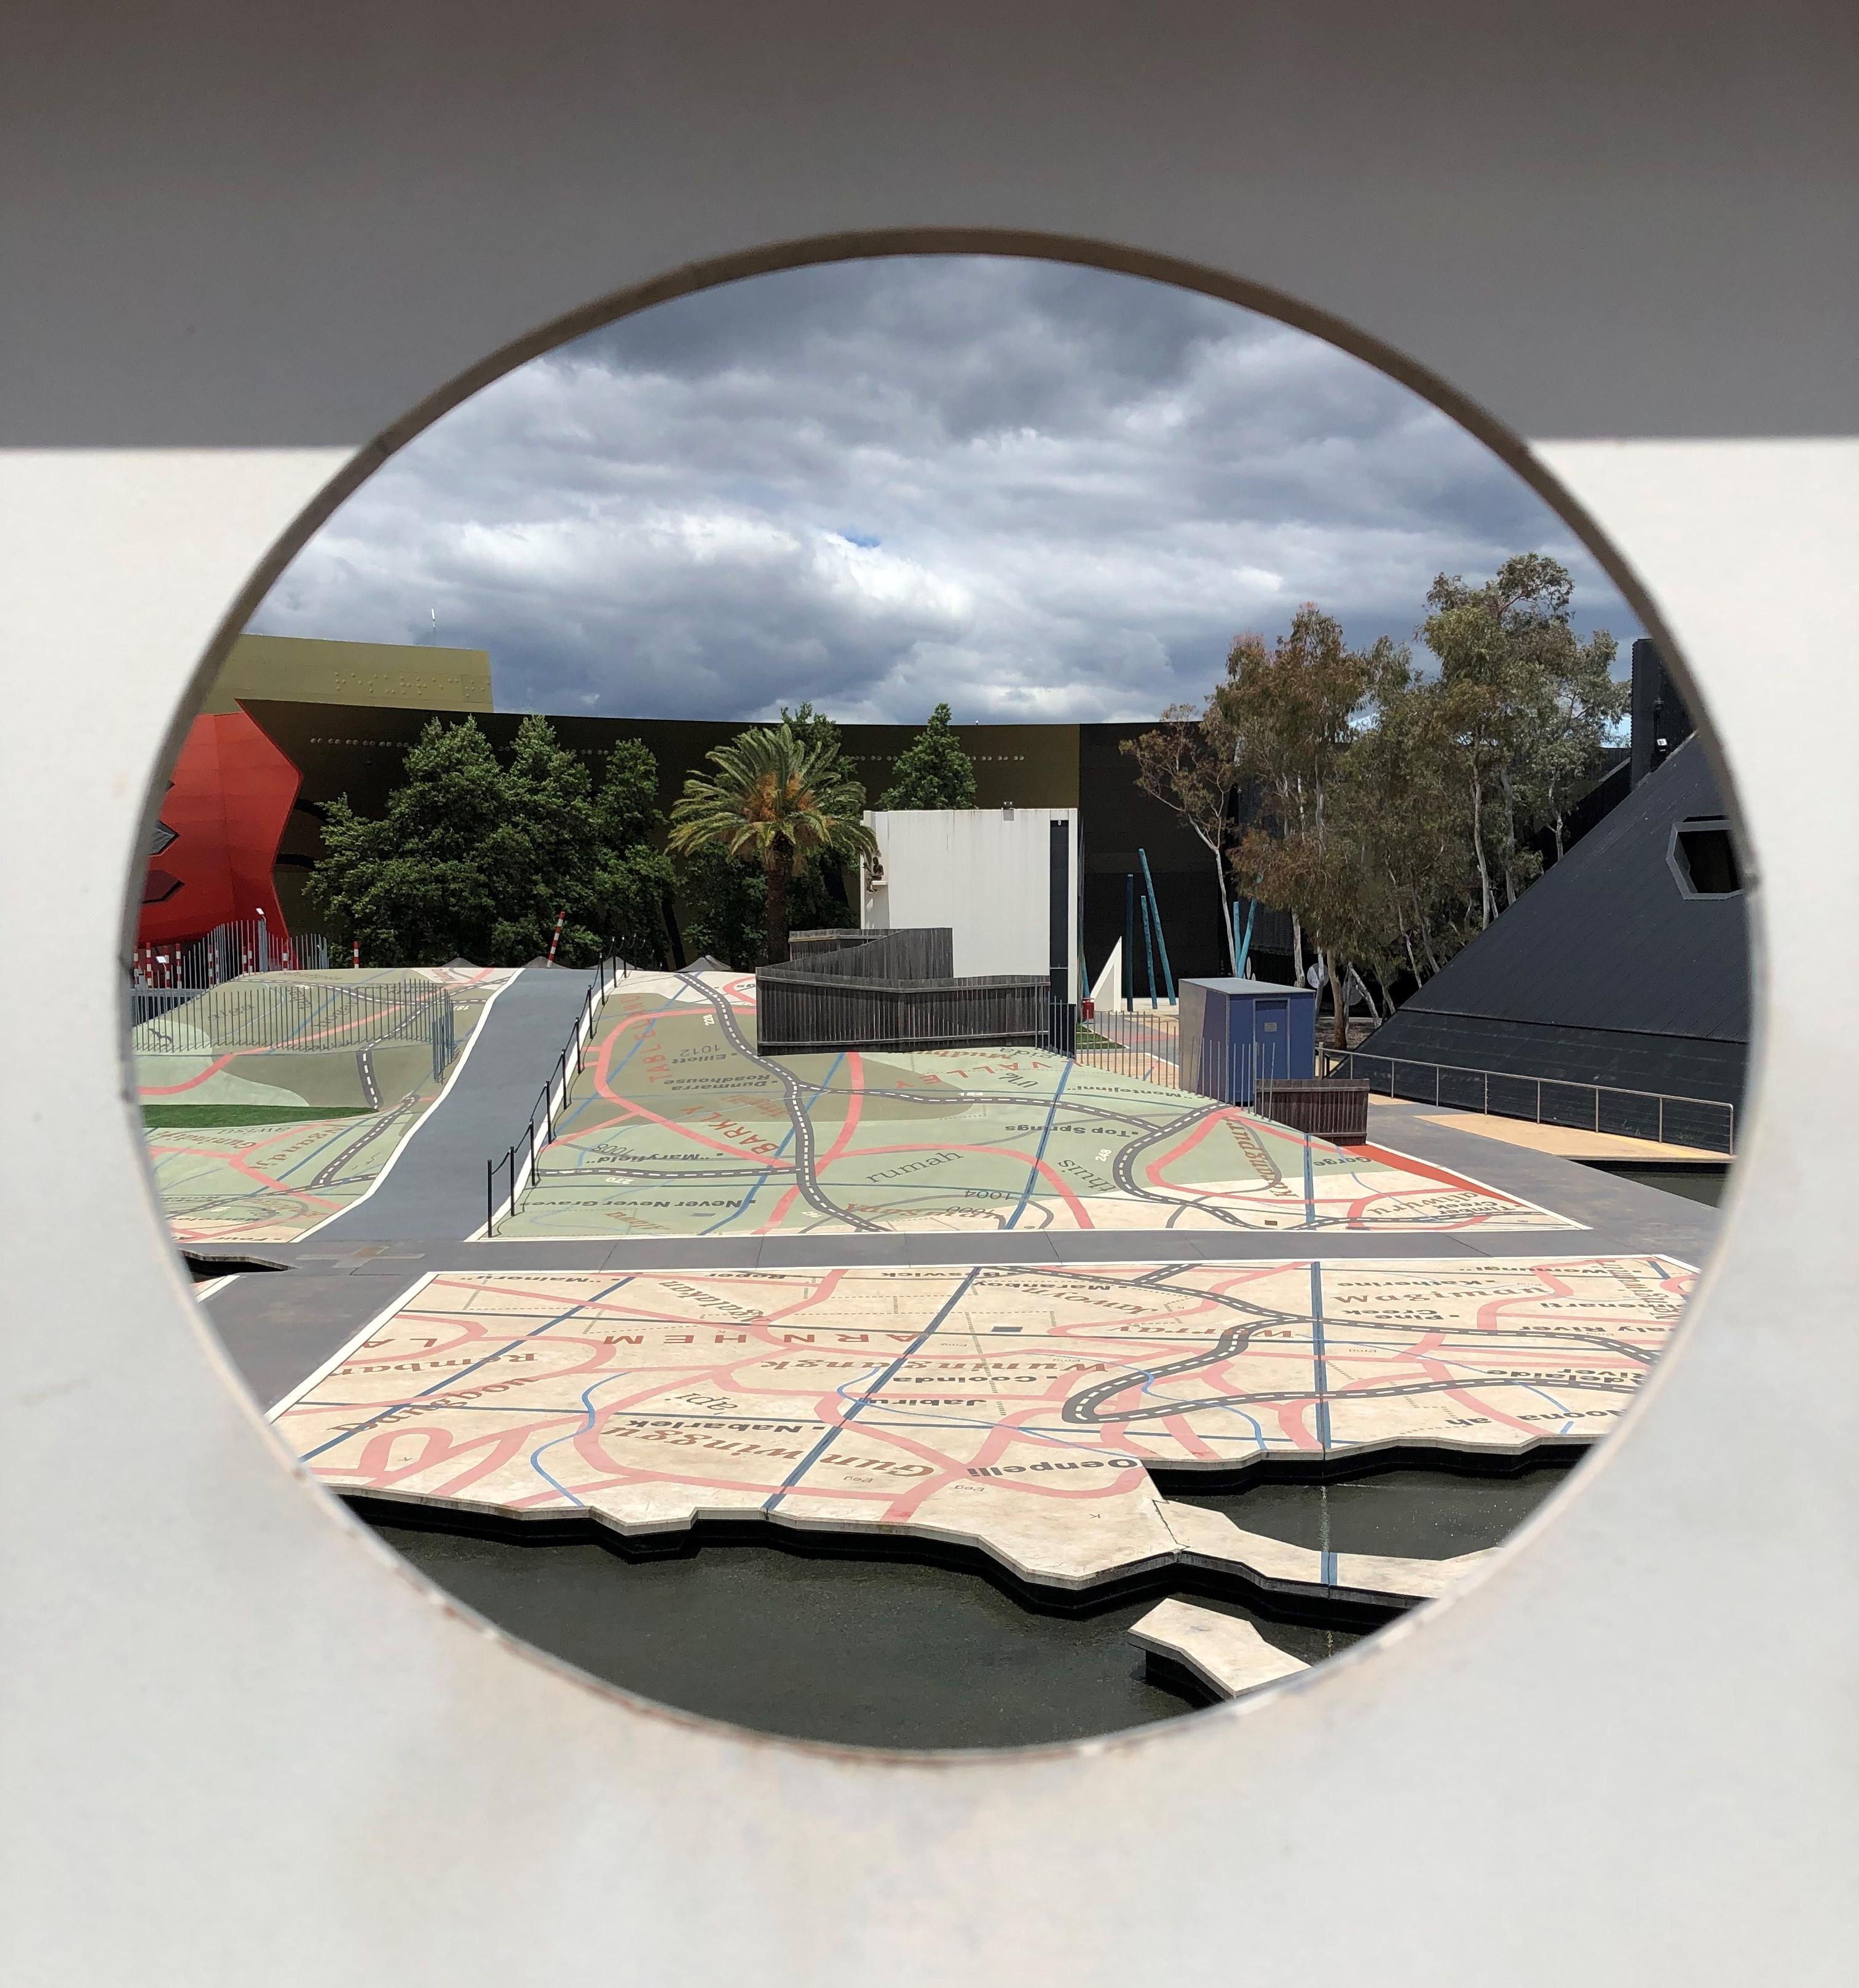 Window view of the Garden of Australian Dreams